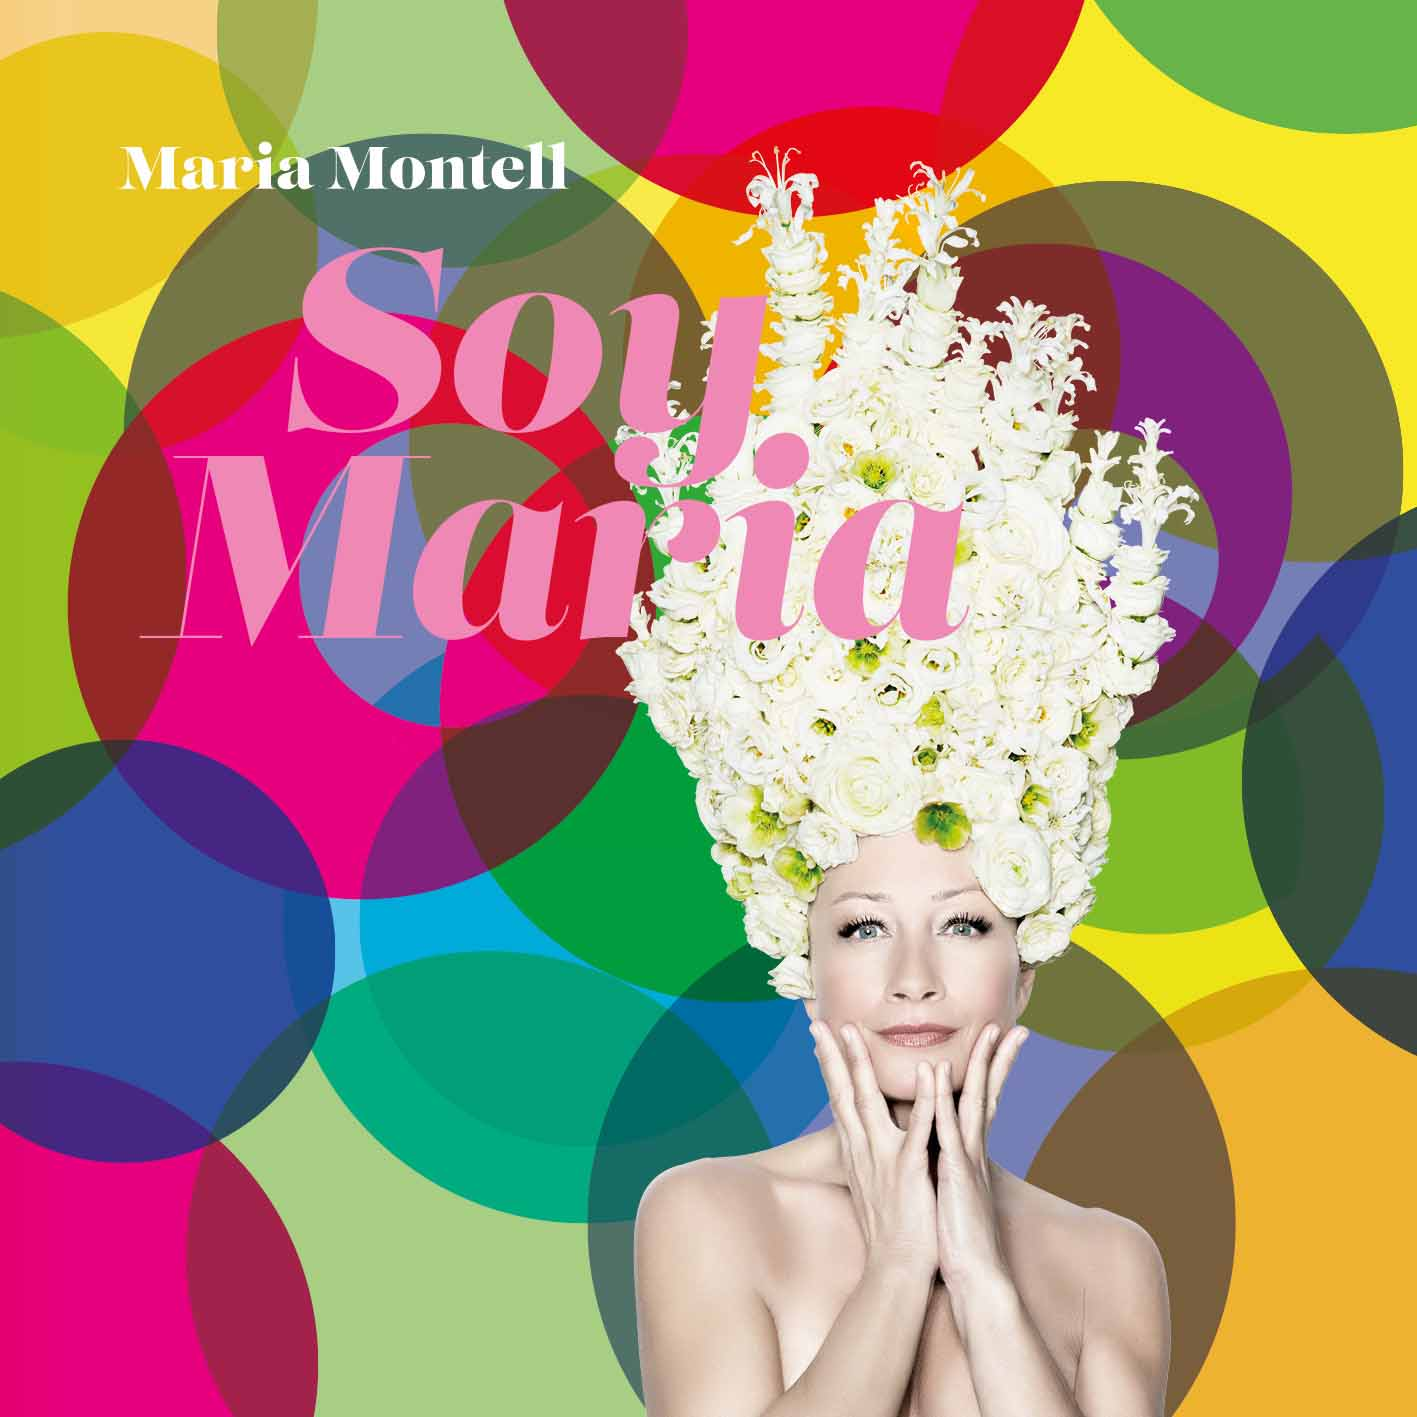 Soy Maria